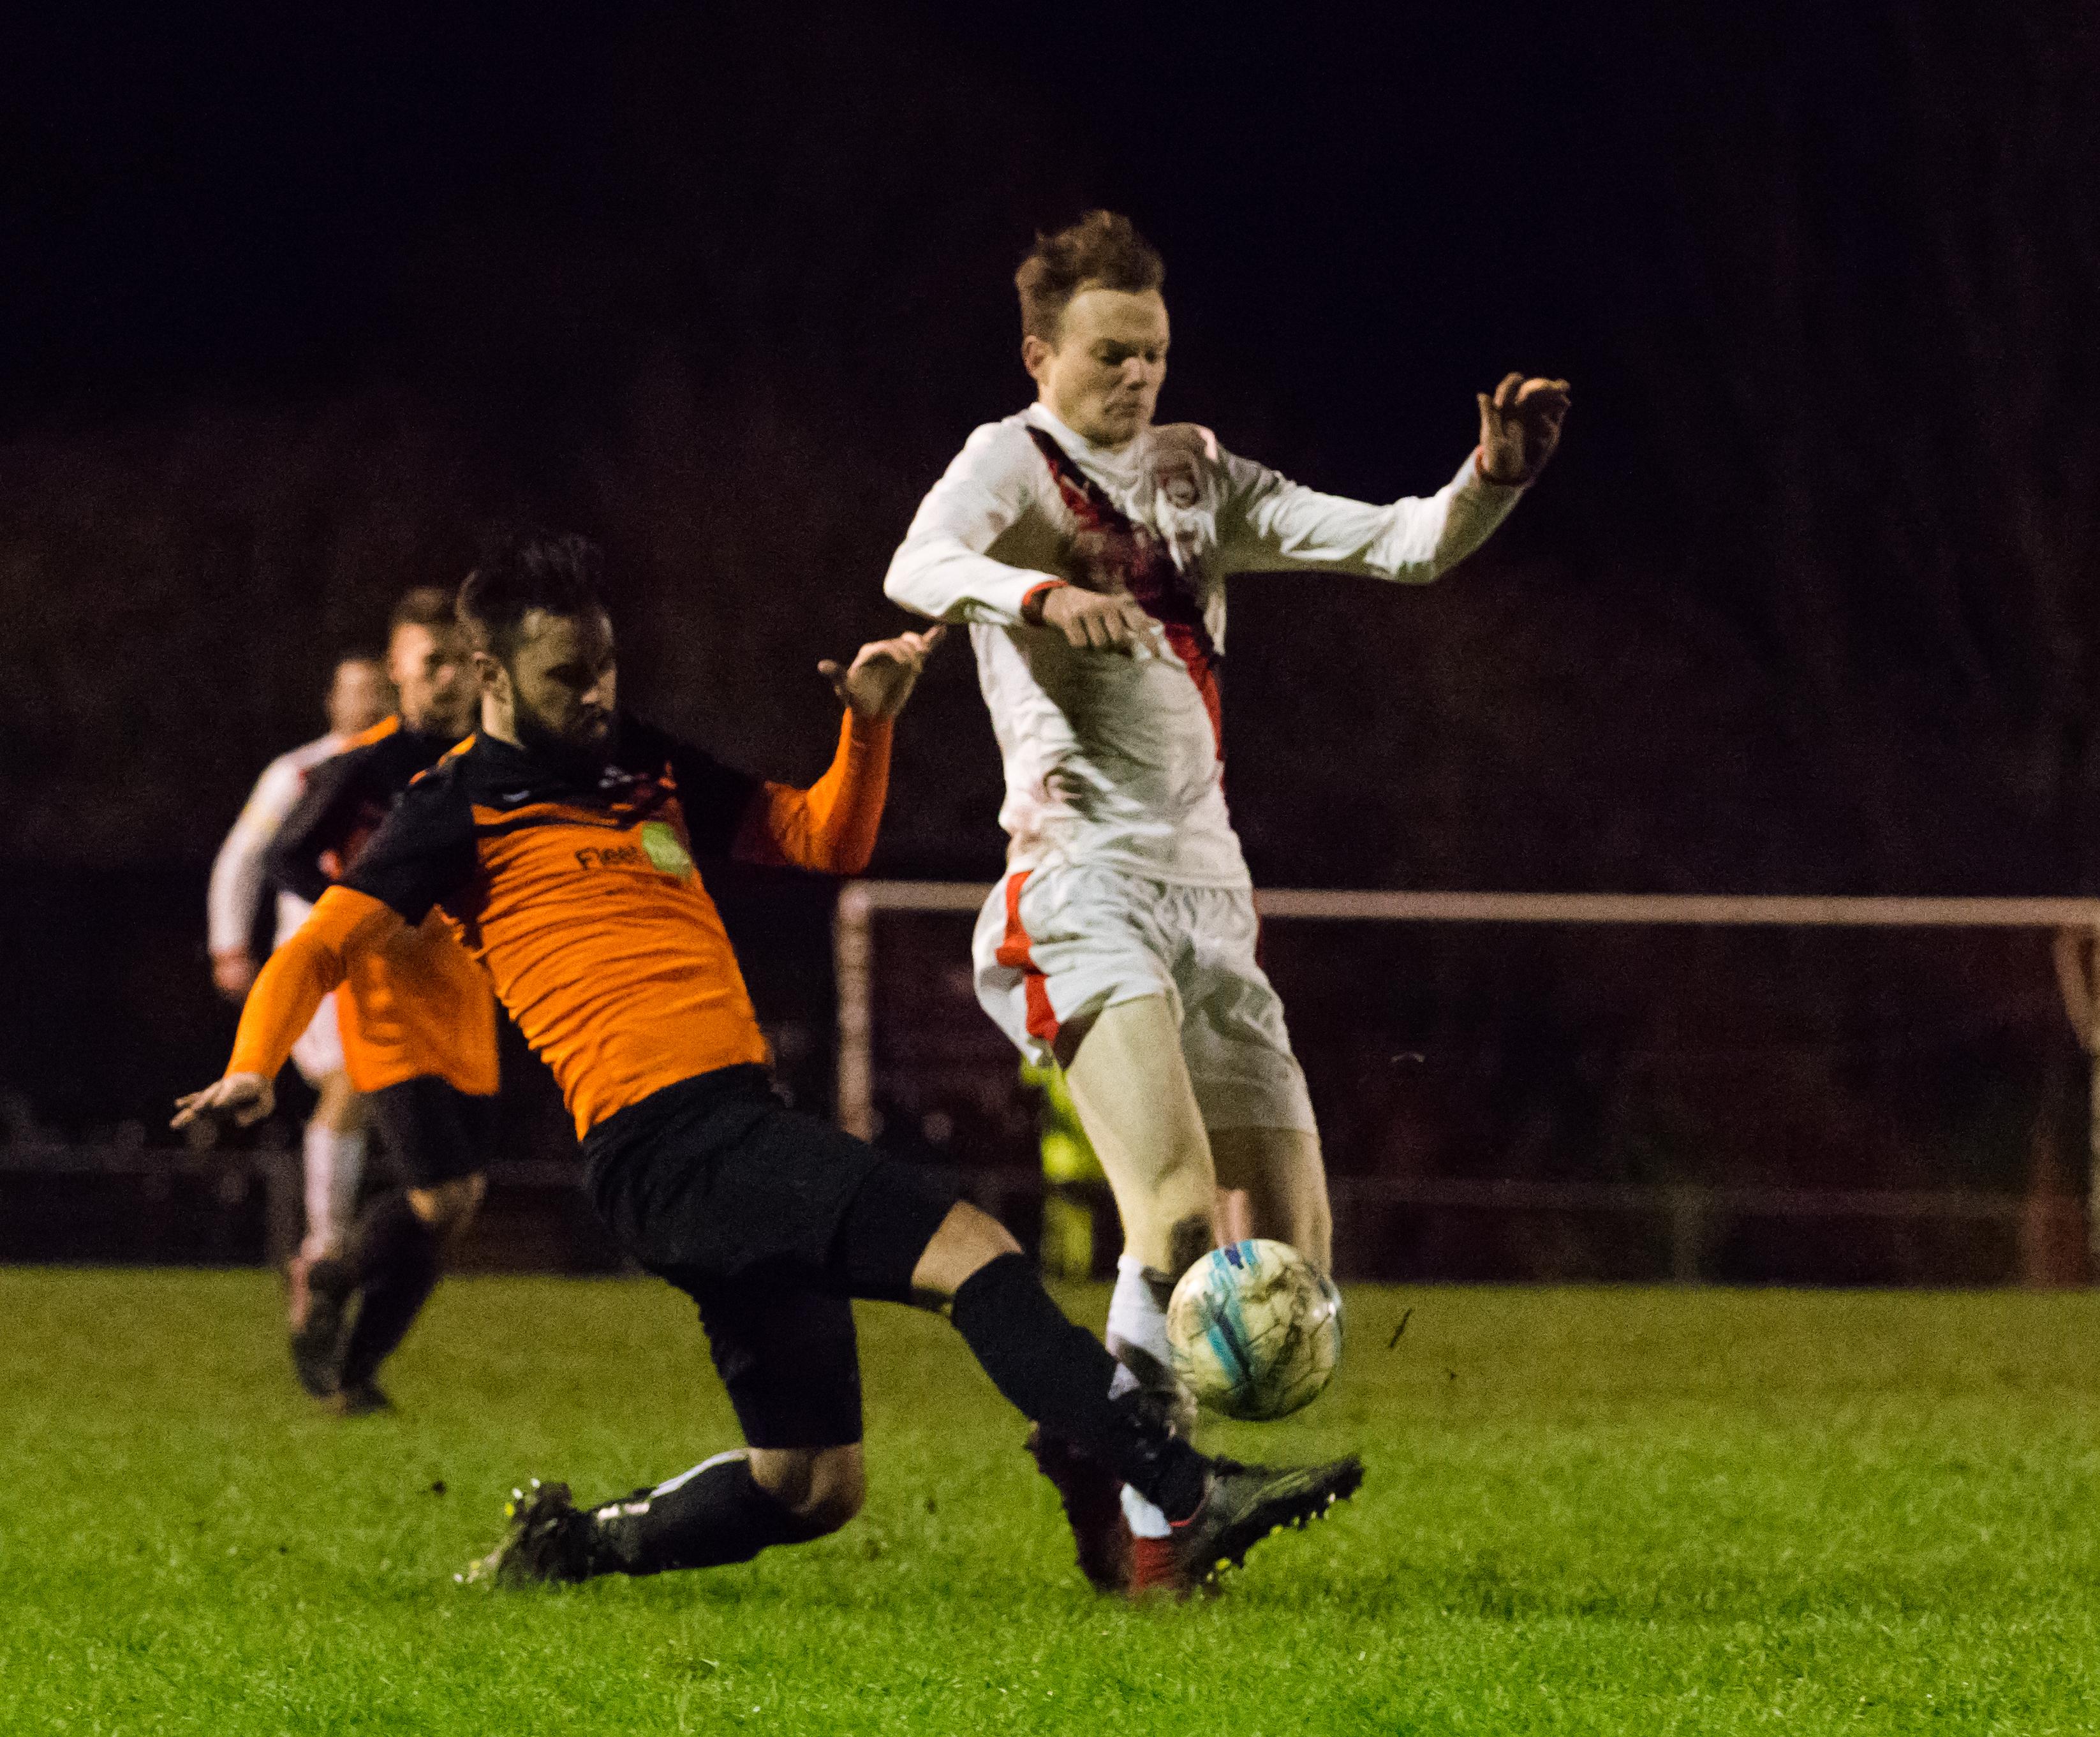 Mile Oak U21s vs Southwick FC U21s 14.12.17 27